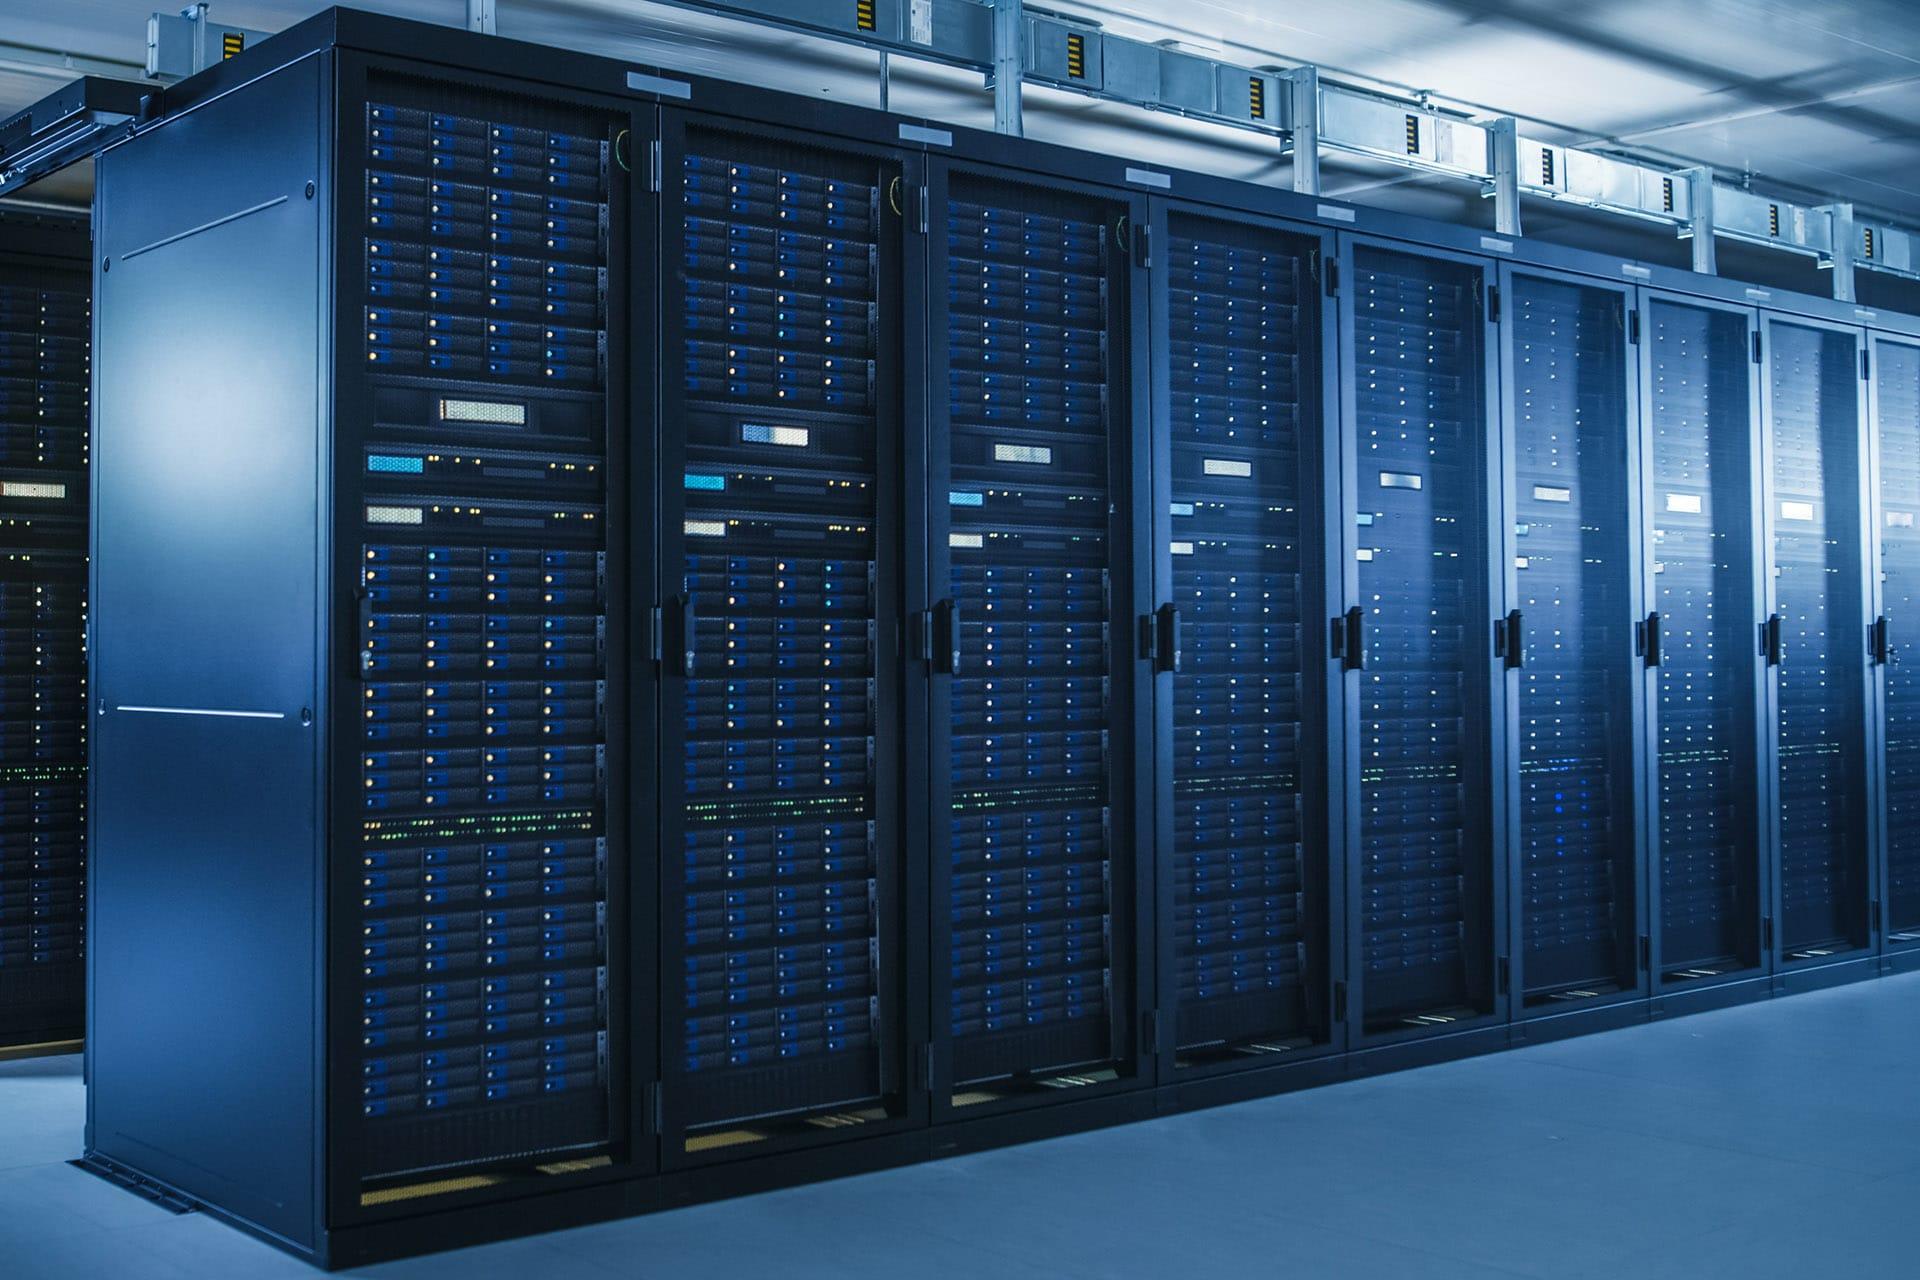 https://venomit.com/wp-content/uploads/2021/09/virtual-storage-better-manage-business.jpg